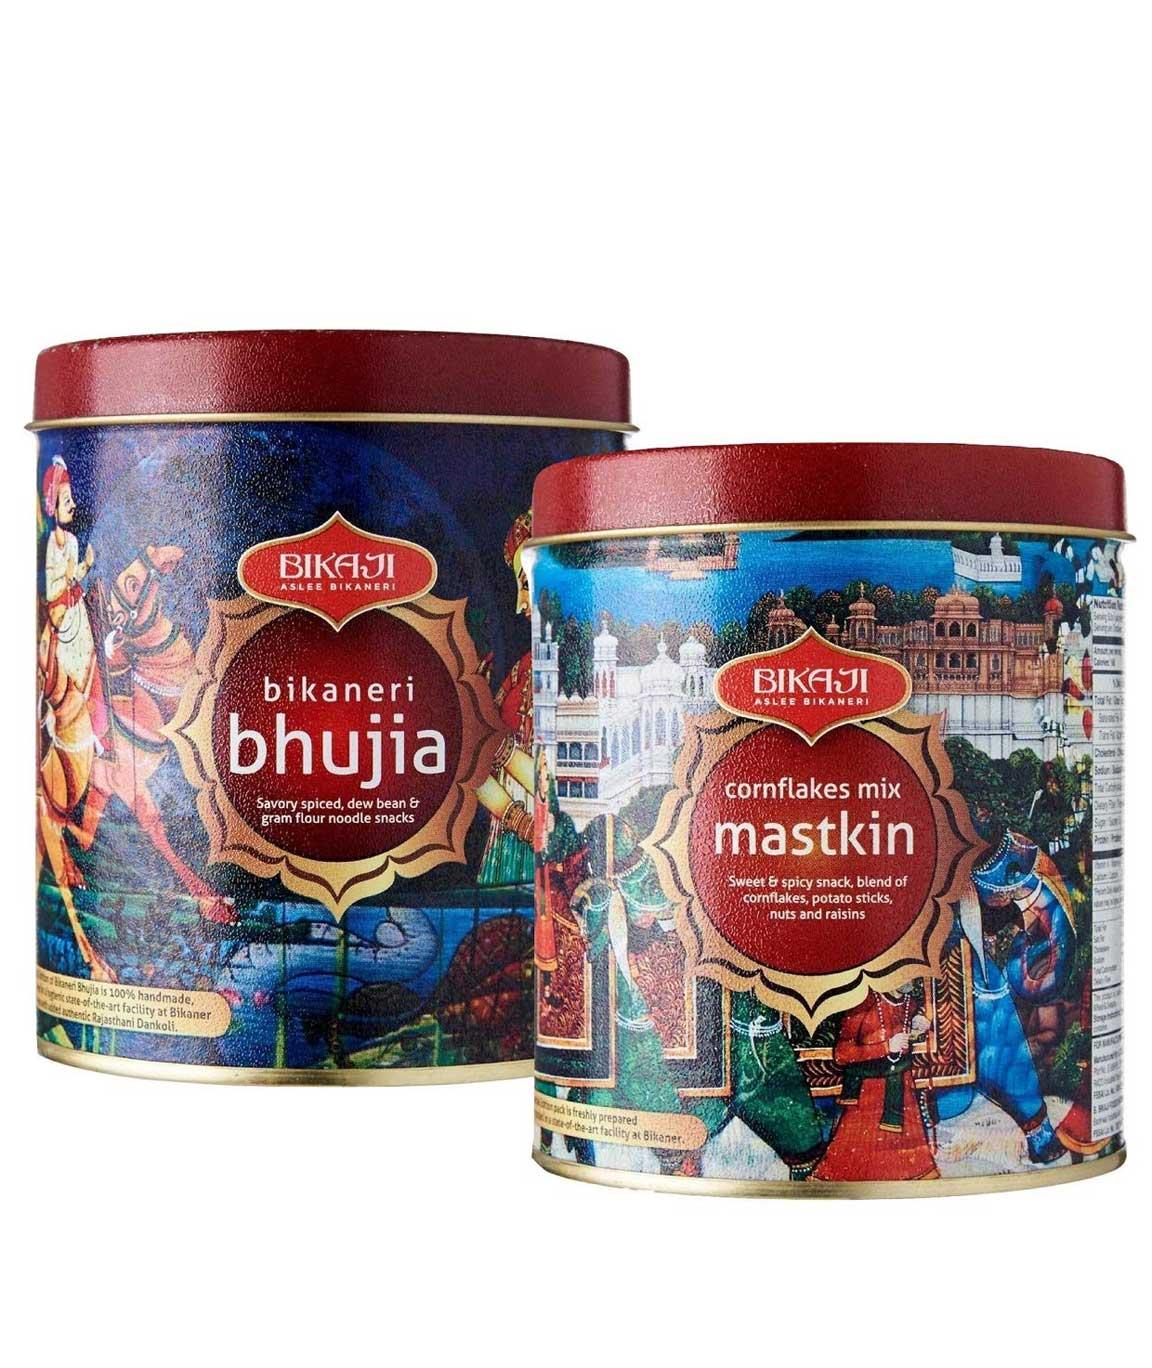 Bikaji Snack Combo Pack - Bikaneri Bhujia 200g(Tin) - Cornflakes Mix 200g(Tin) - Pack of 2